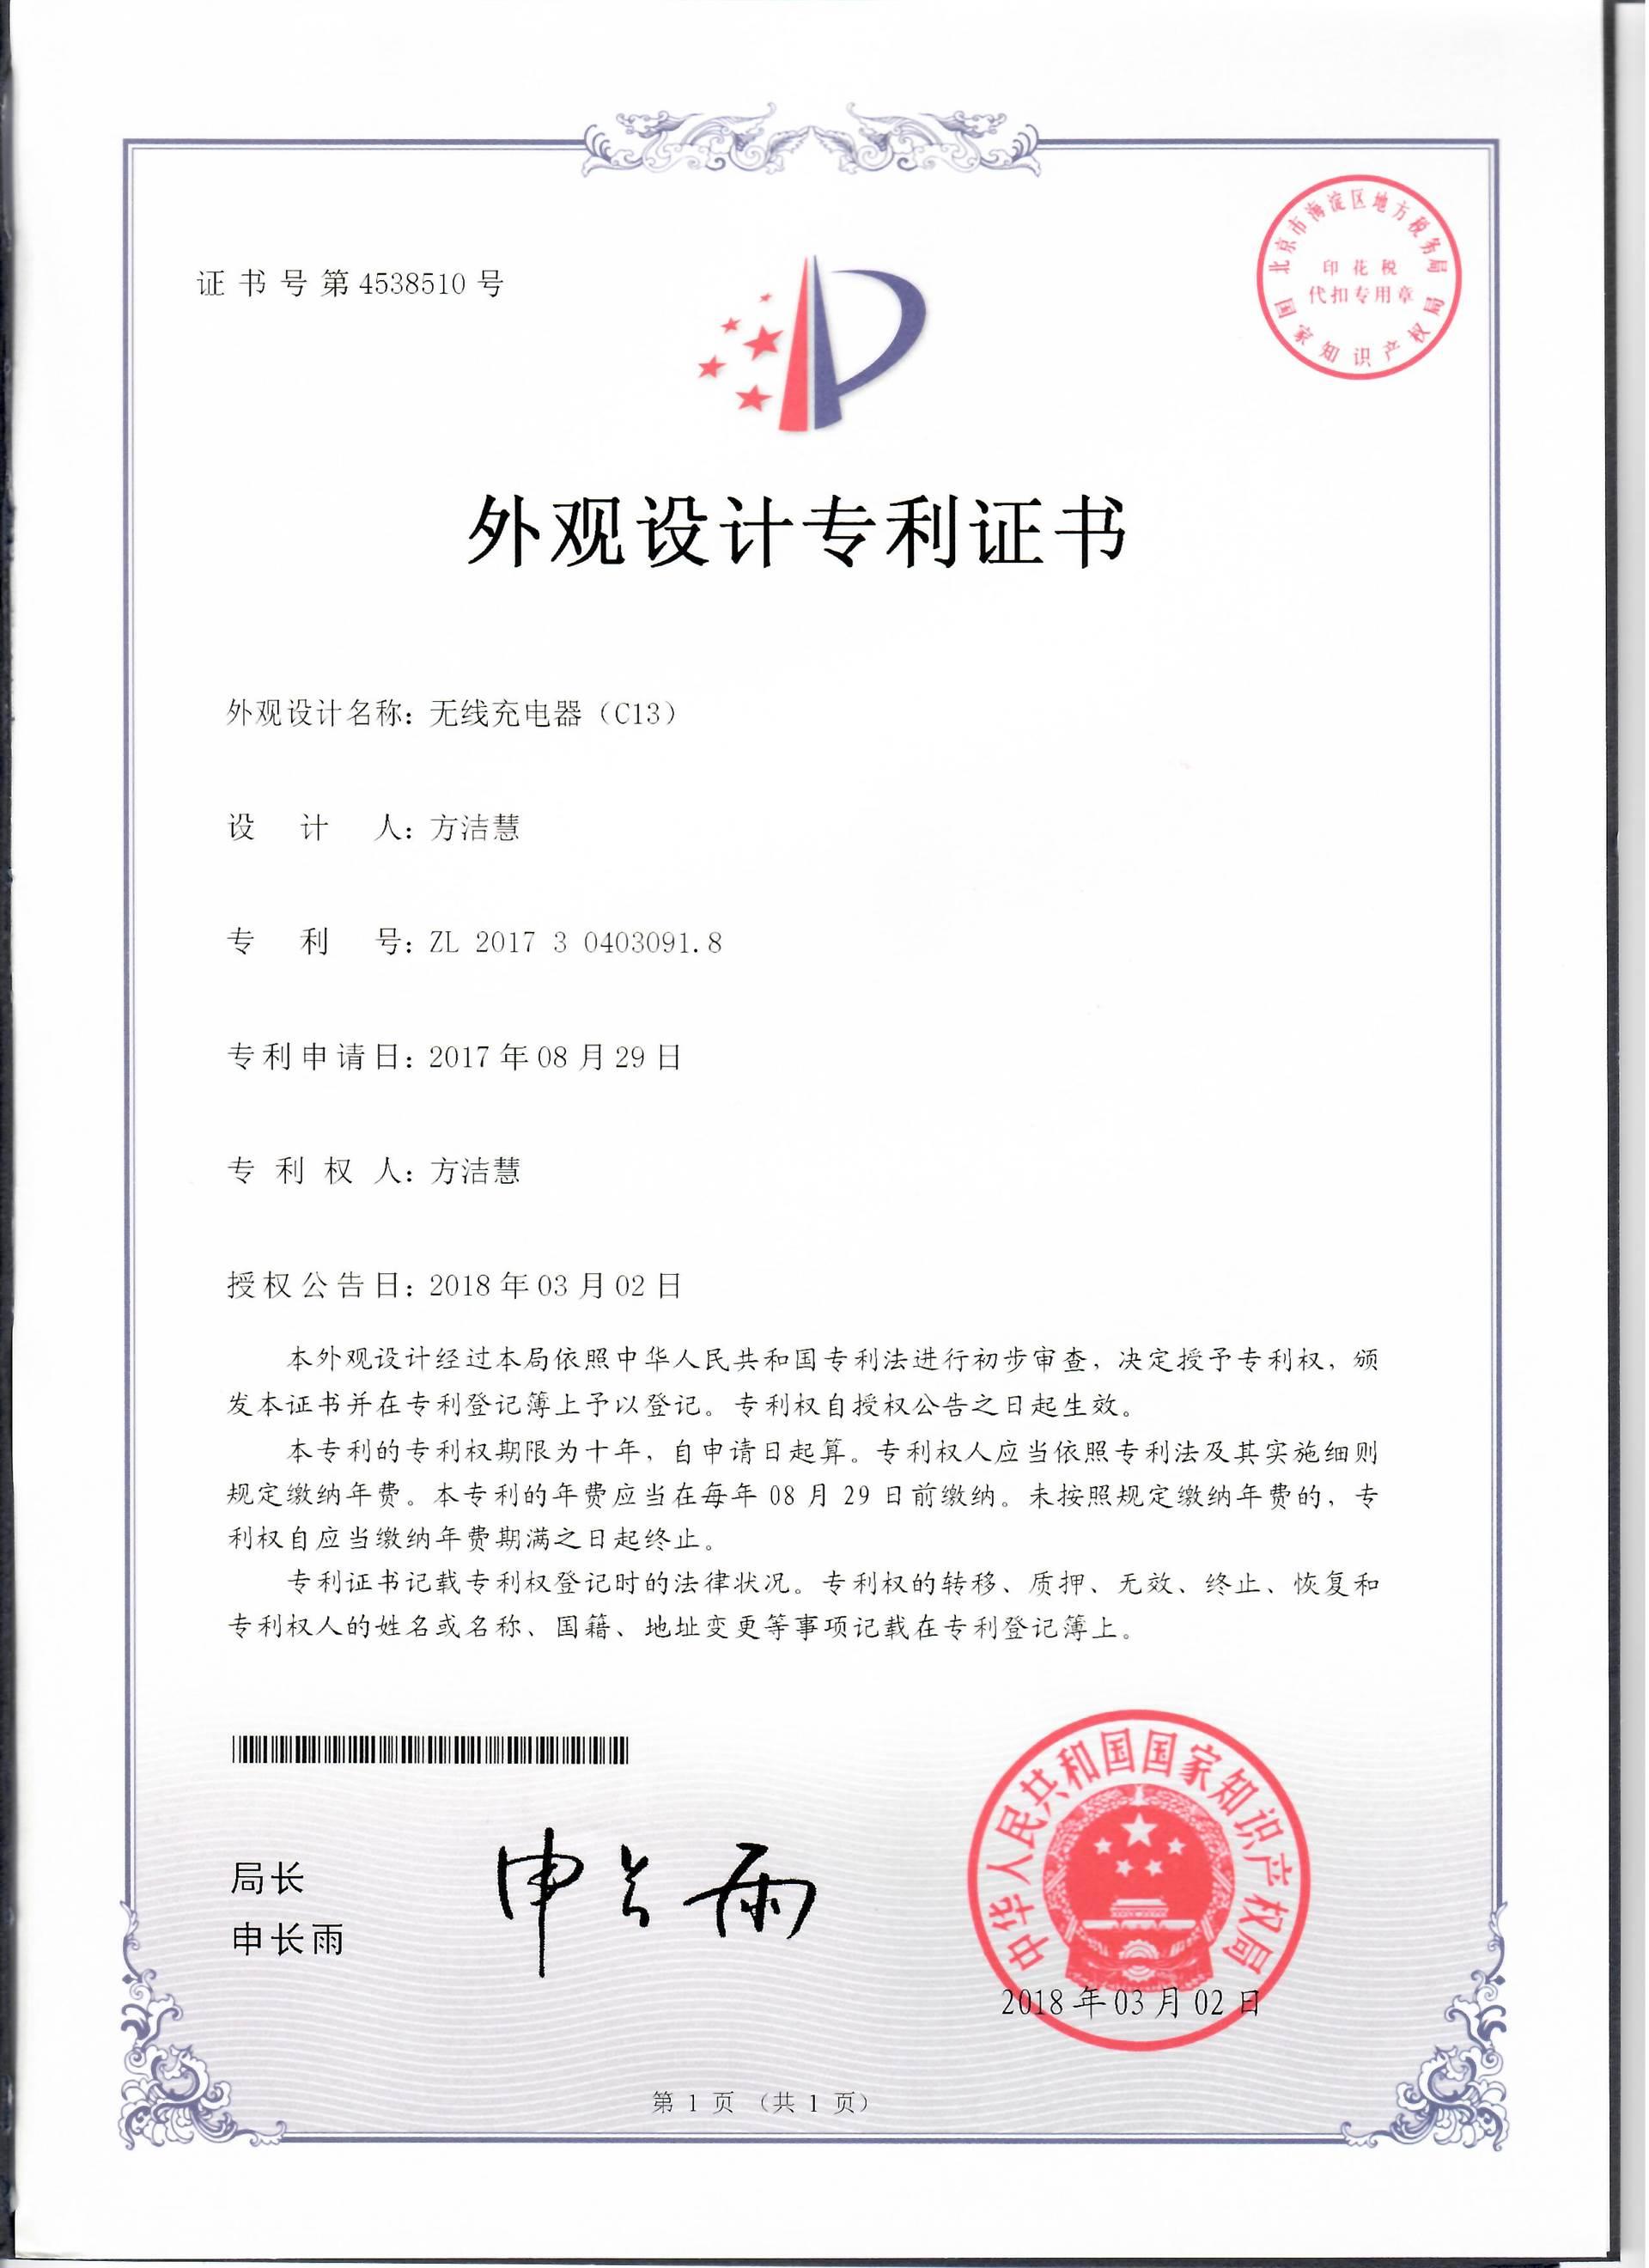 C13外观设计专利证书